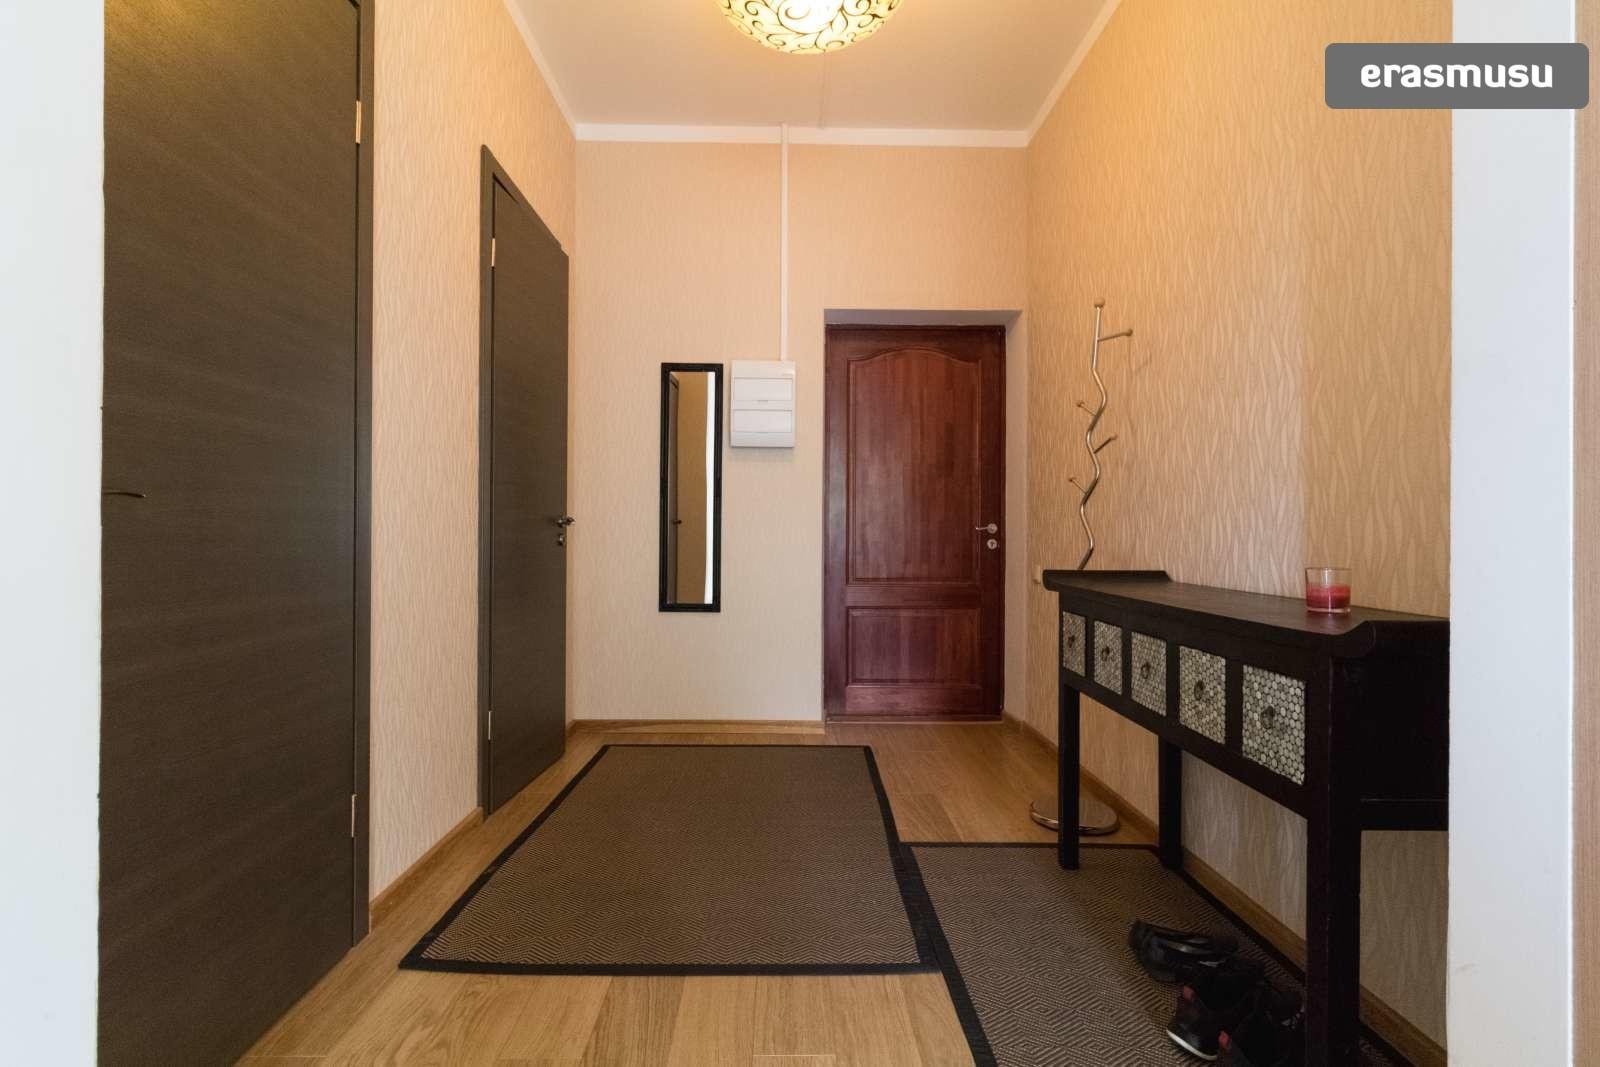 stylish-1-bedroom-apartment-balcony-rent-zasulauks-fe2e4c7445c35